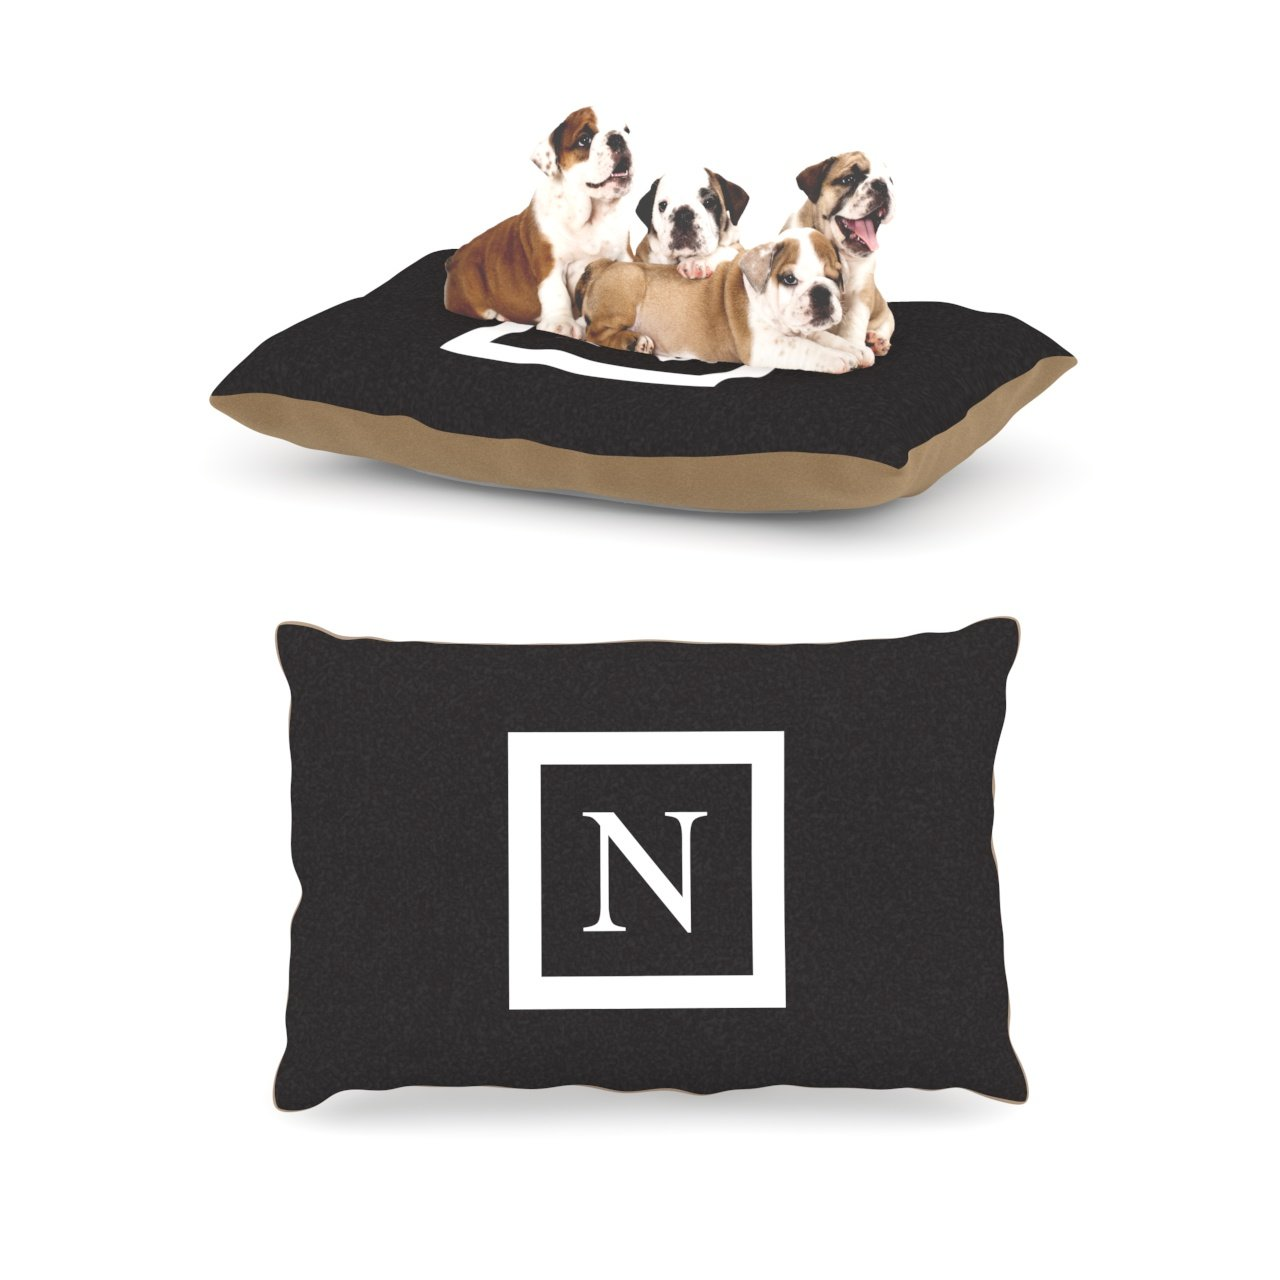 N Large 30\Kess InHouse Solid Black Fleece Dog Bed, 30 by 40Inch, Monogram LetterN